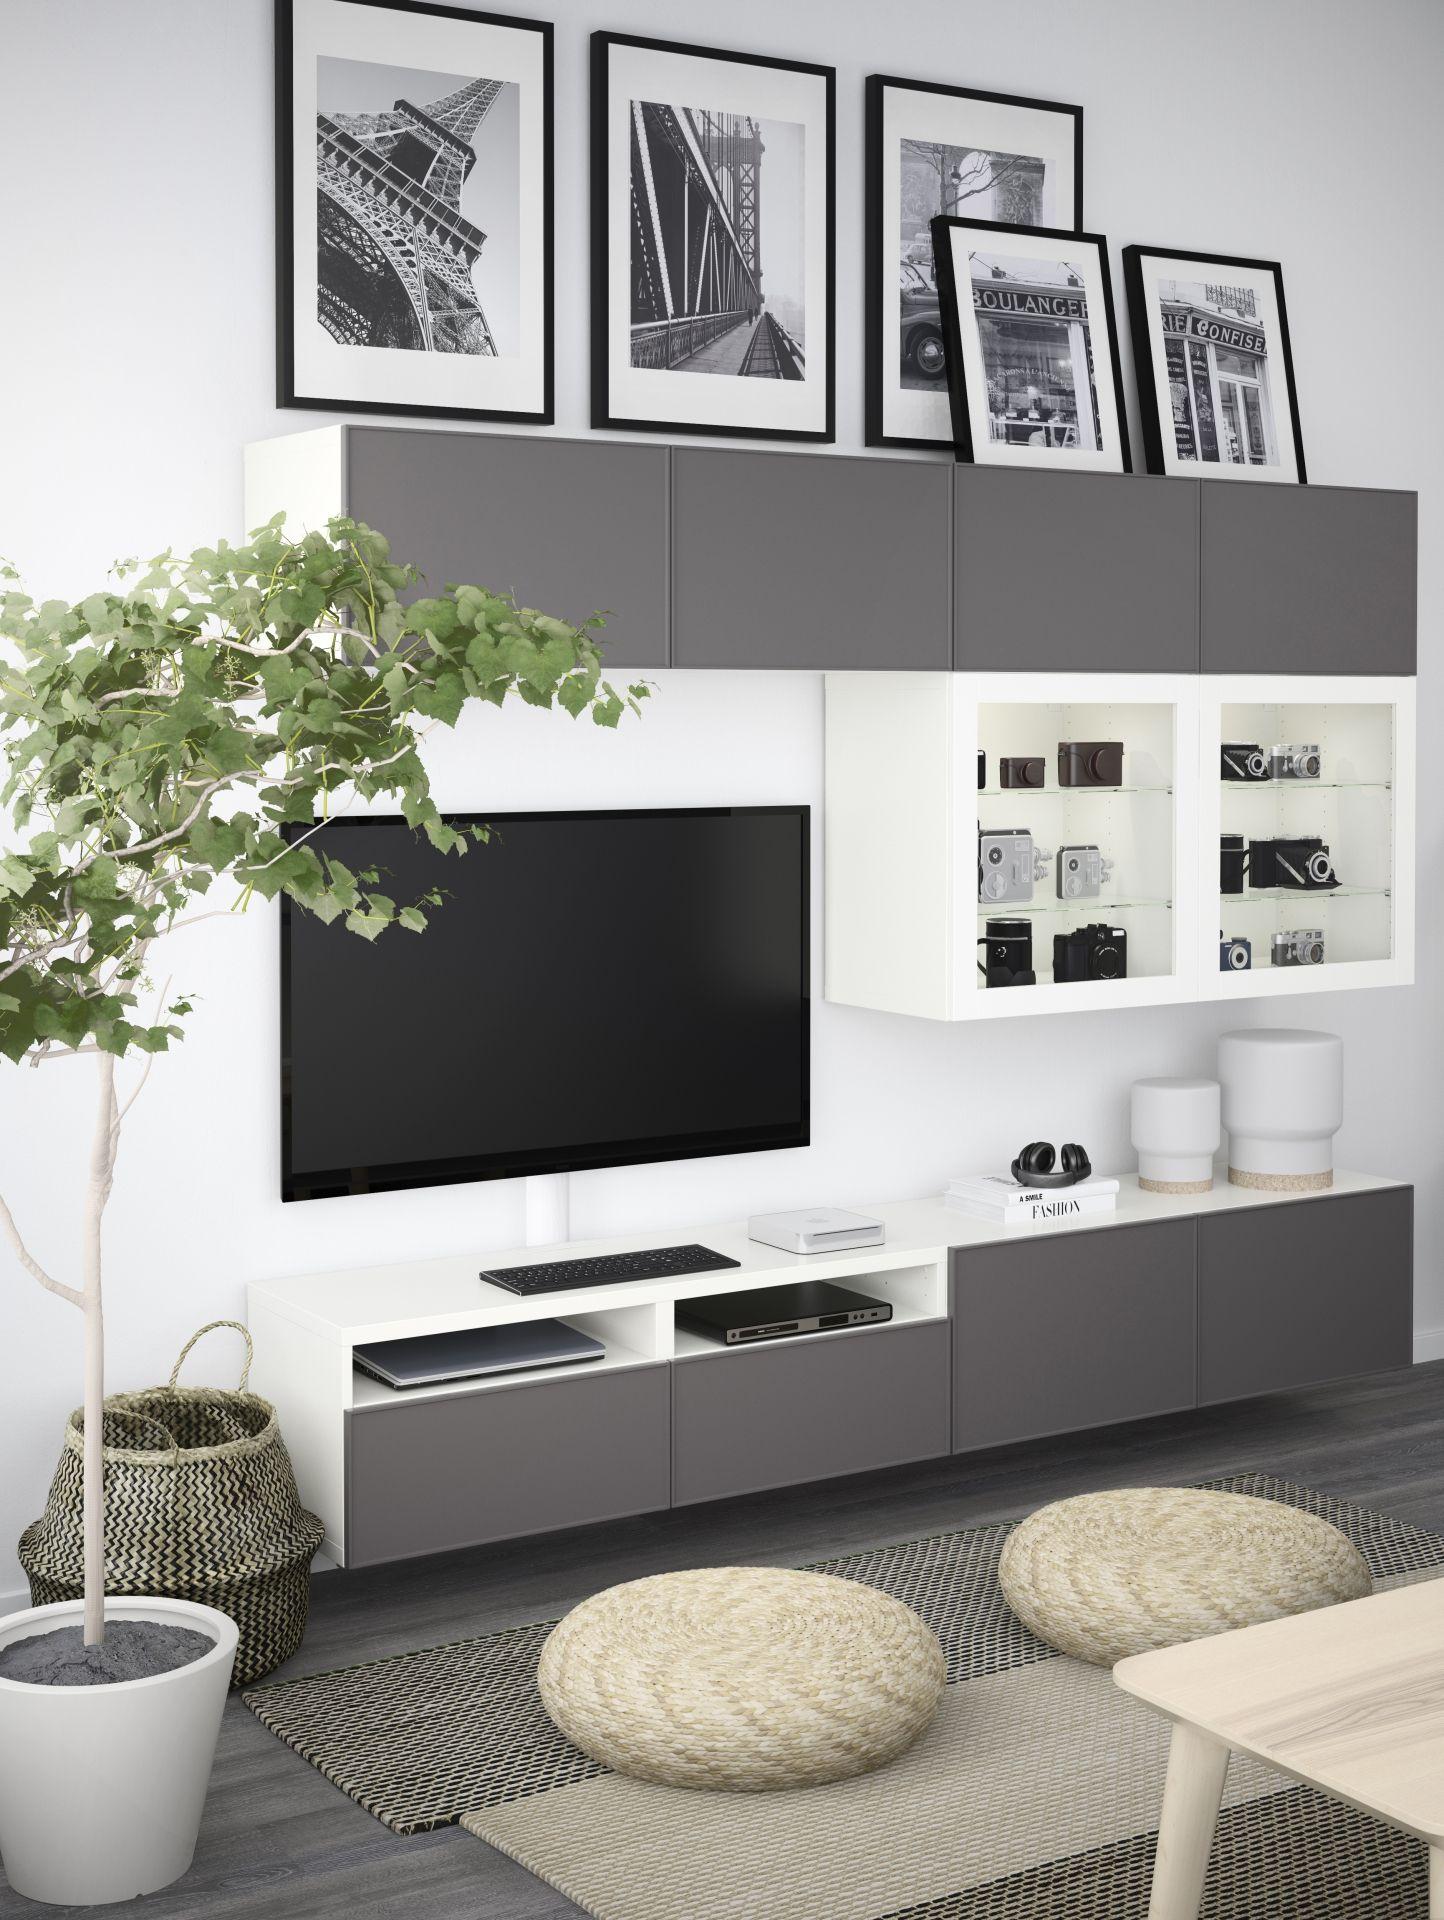 Mobel Einrichtungsideen Fur Jedes Zuhause Wohnzimmer Inspiration Ikea Wohnzimmer Wohnzimmer Einrichten